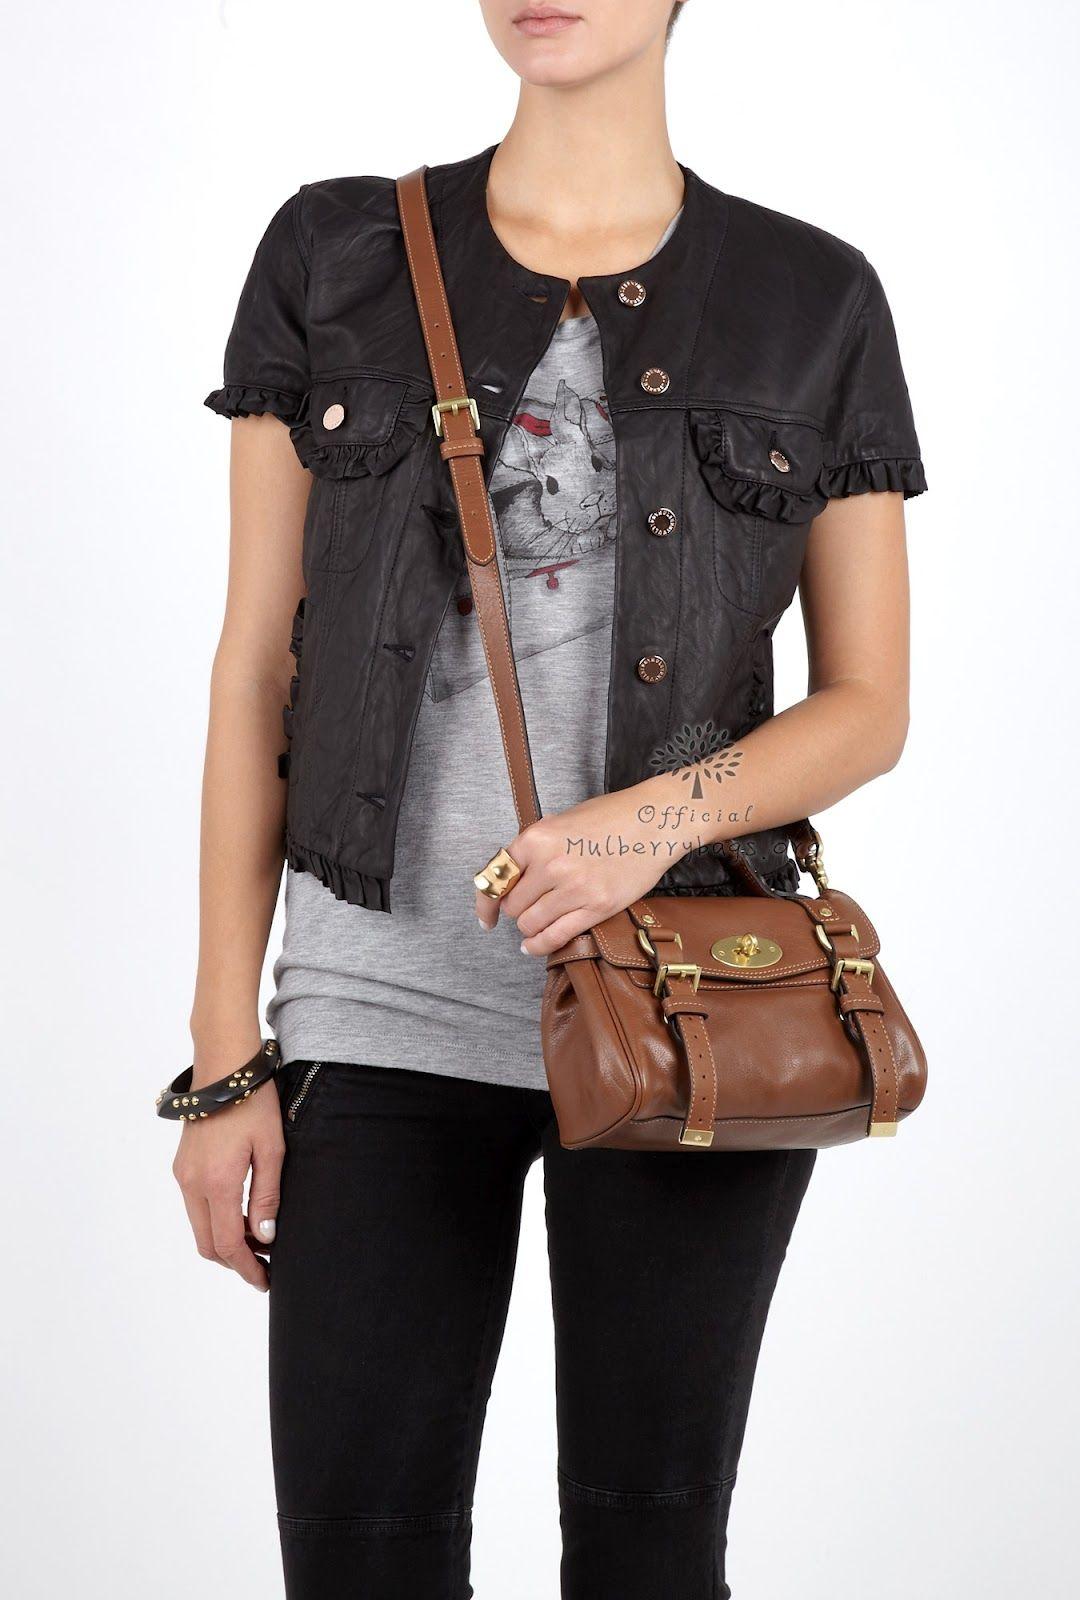 d992e927cc Mulberry Mini Alexa | Bags in 2019 | Mulberry bag, Fashion, Fashion ...